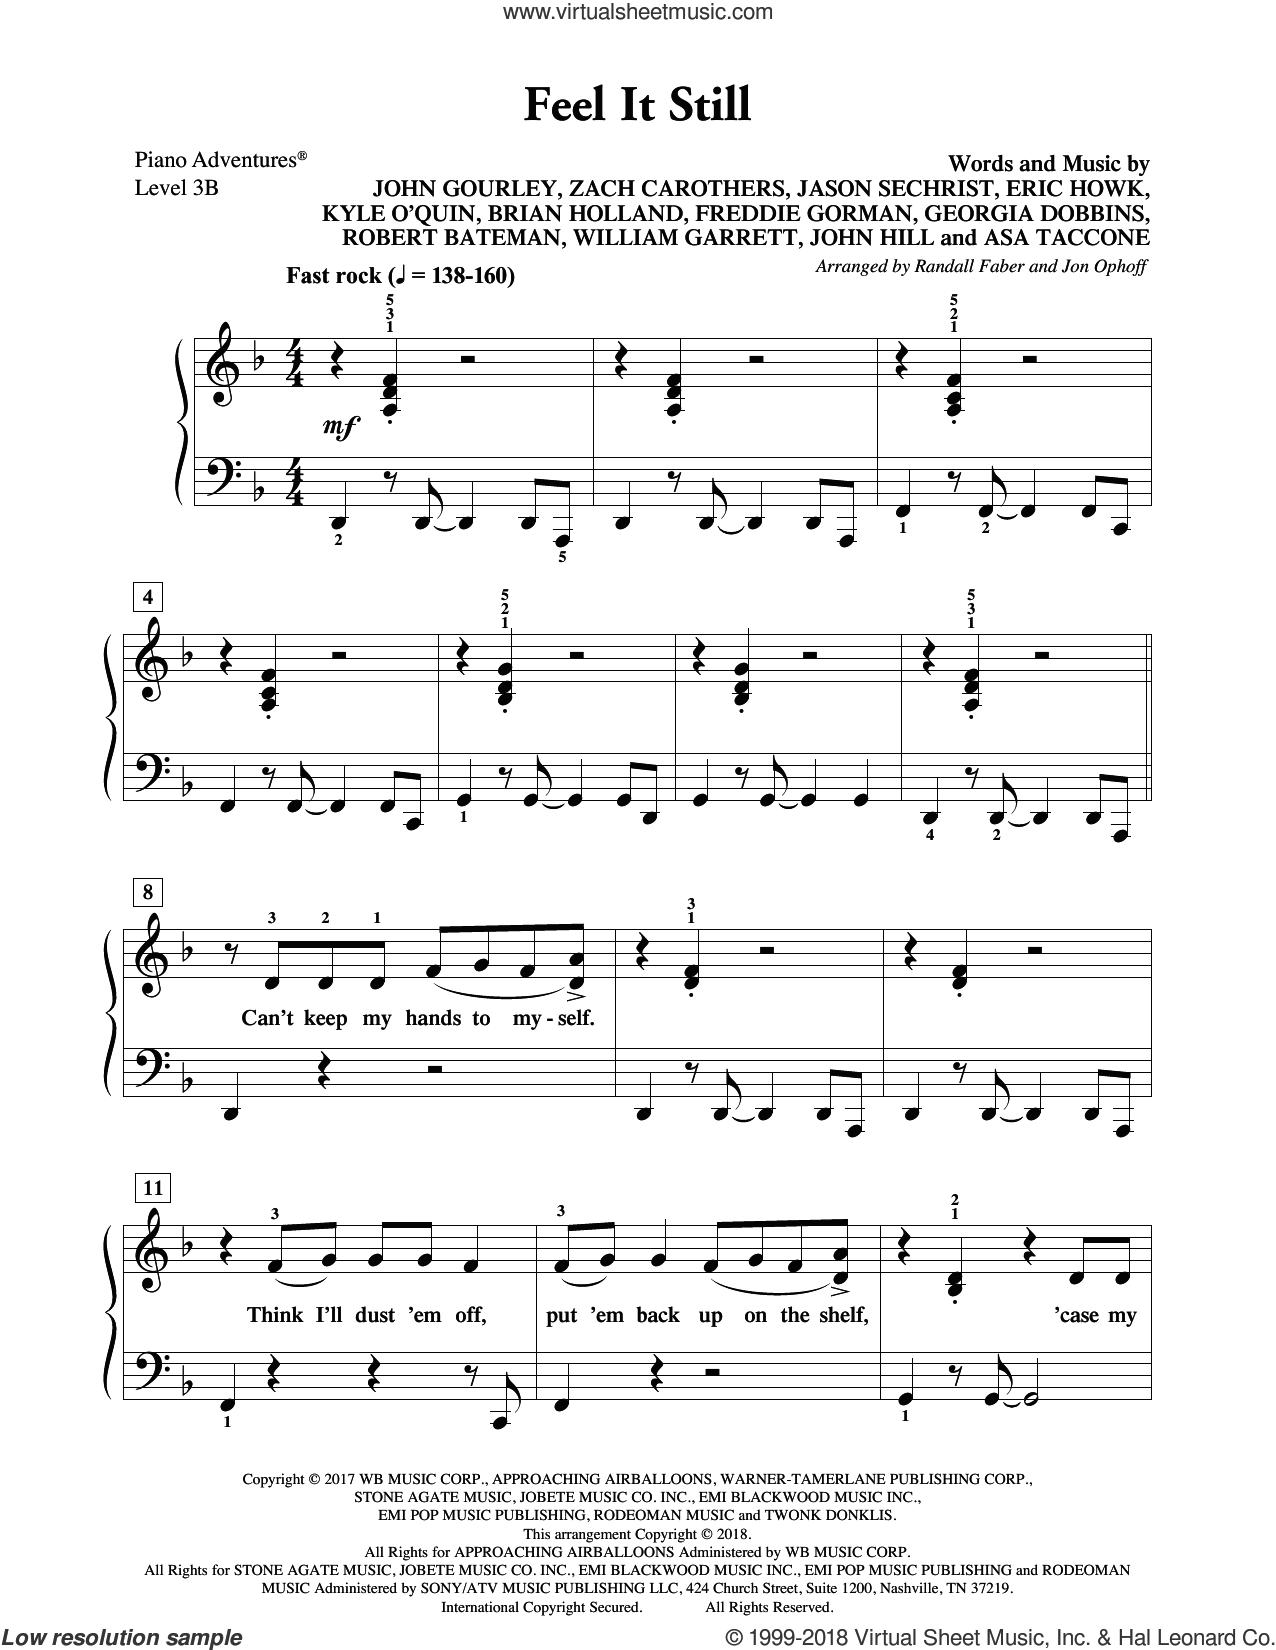 Feel It Still sheet music for piano solo by John Hill, Randall Faber & Jon Ophoff, John Gourley, Portugal. The Man, Zach Carothers, Jason Wade Sechrist, John Baldwin Gourley, Robert Bateman and William Garrett, intermediate/advanced skill level